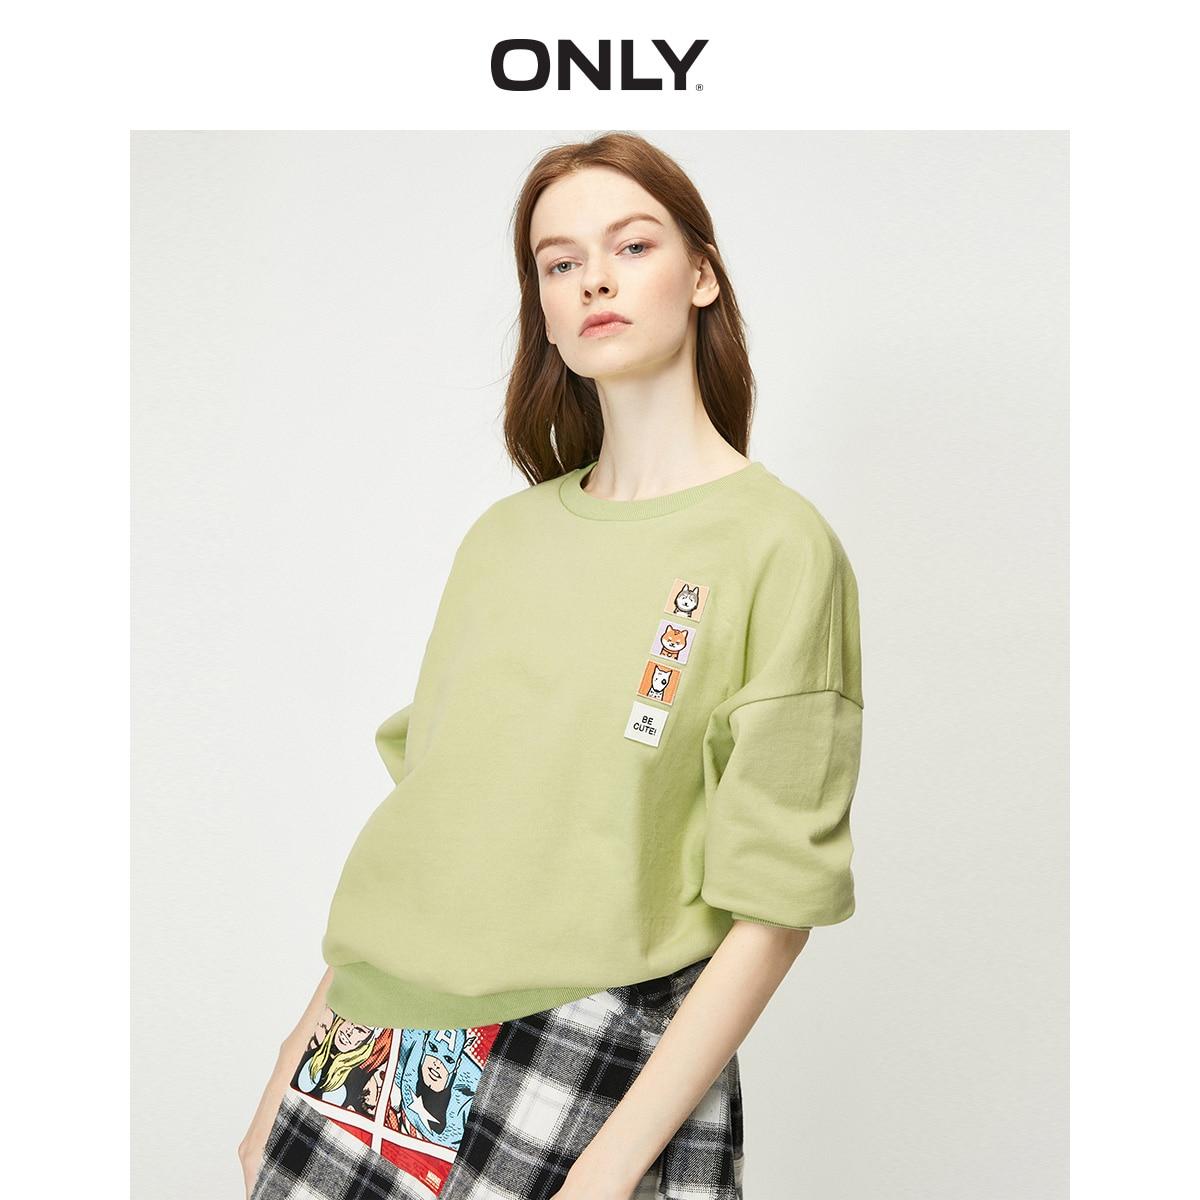 ONLY Women's Loose Fit Cartoon Patch Sweatshirt   12019S605